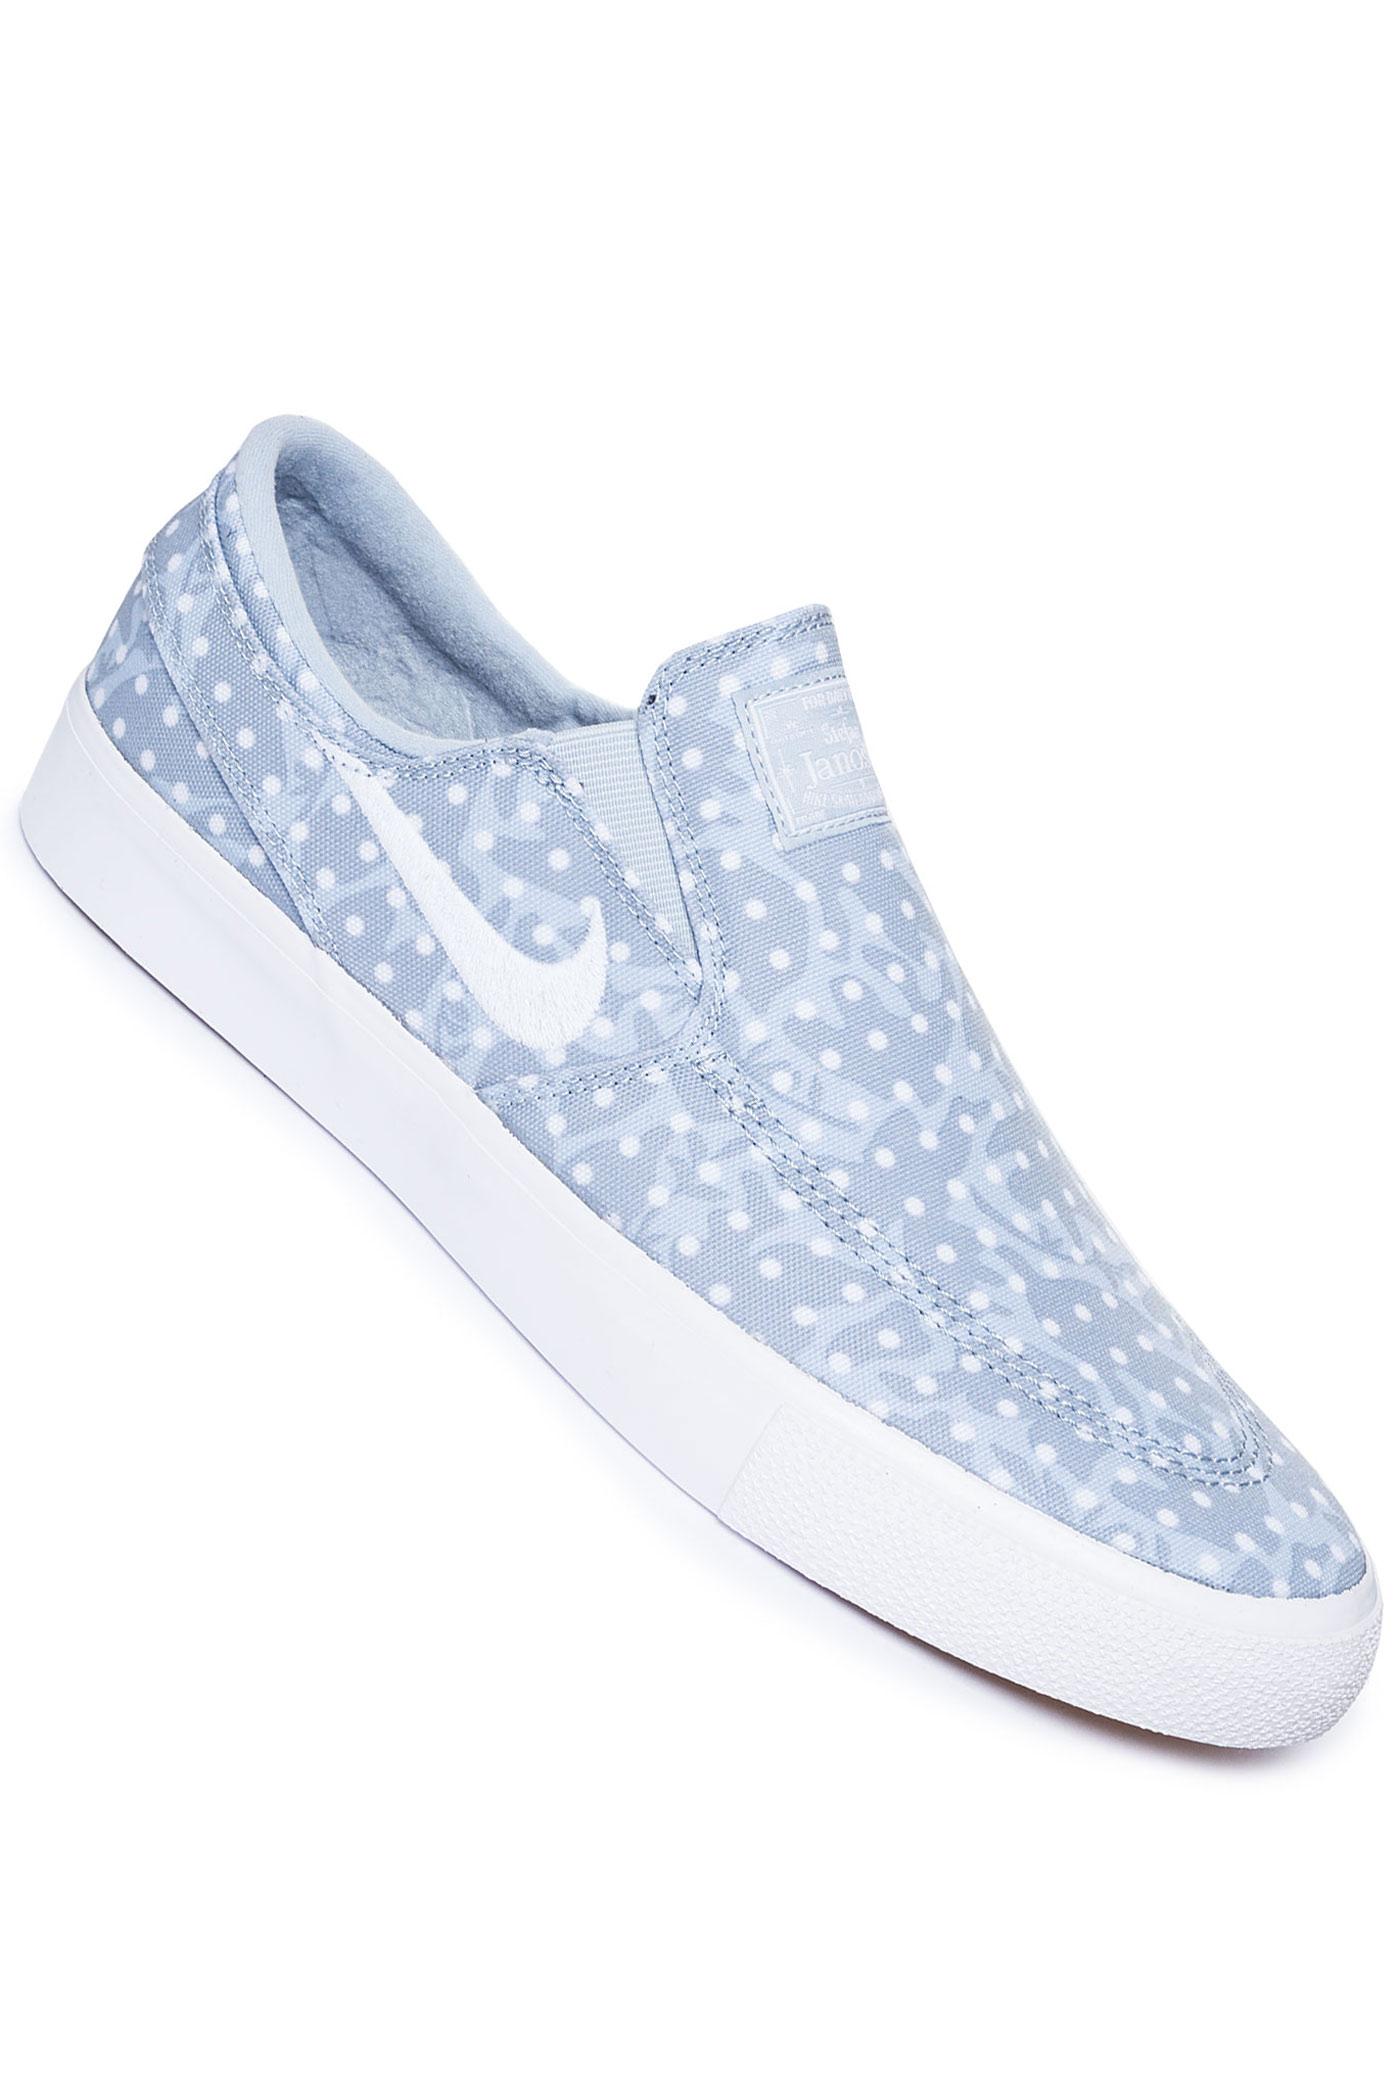 White Sb Armory Canvas Rm Blue Chaussurelight Nike Zoom Janoski Slip IYf7mb6gyv